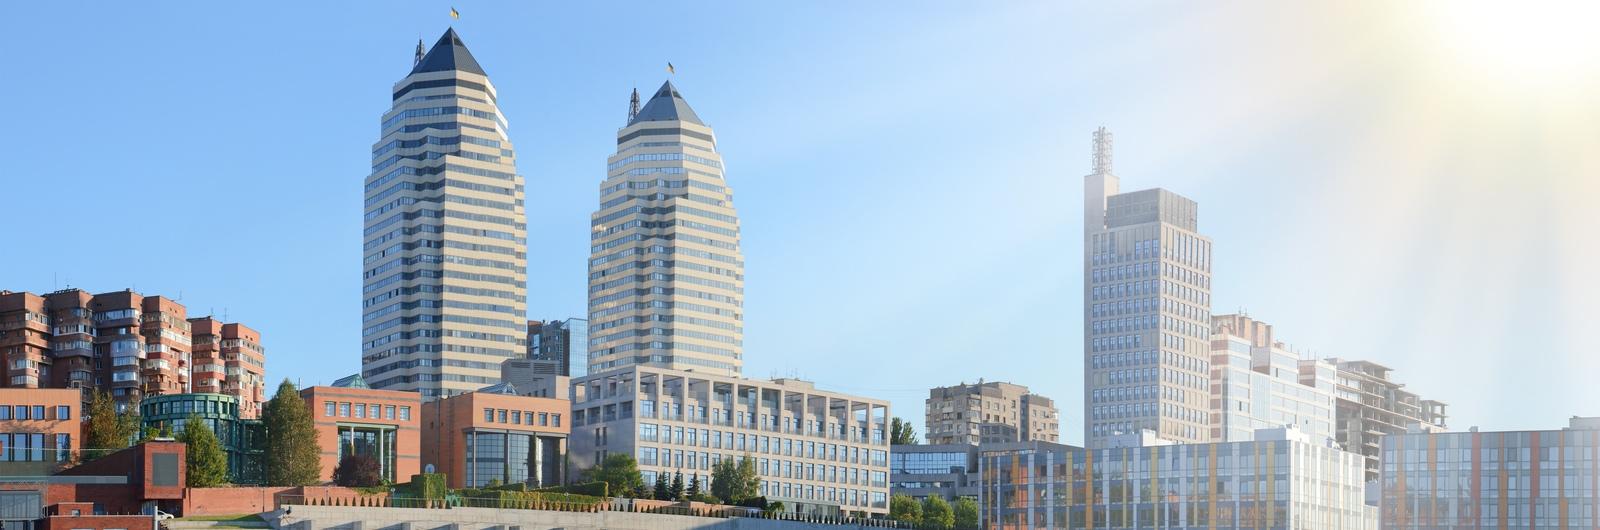 dnipro city header